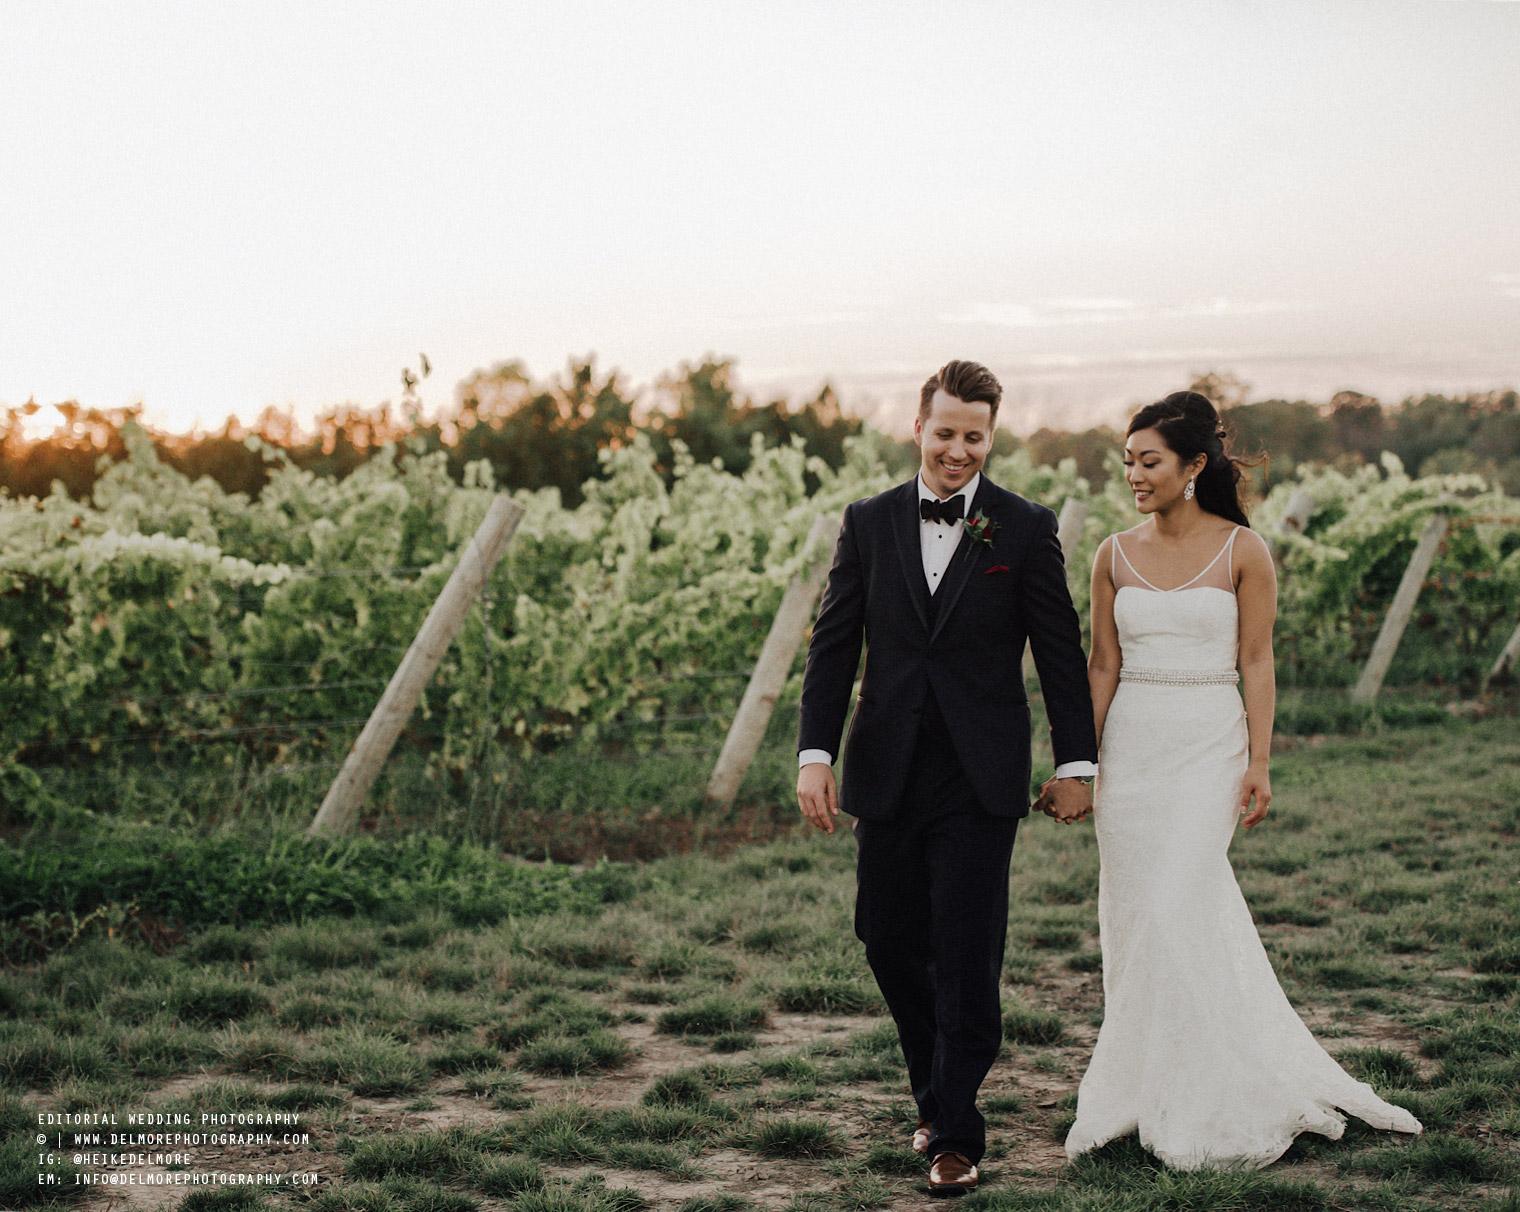 top-windsor-winery-wedding-photographer-058.jpg